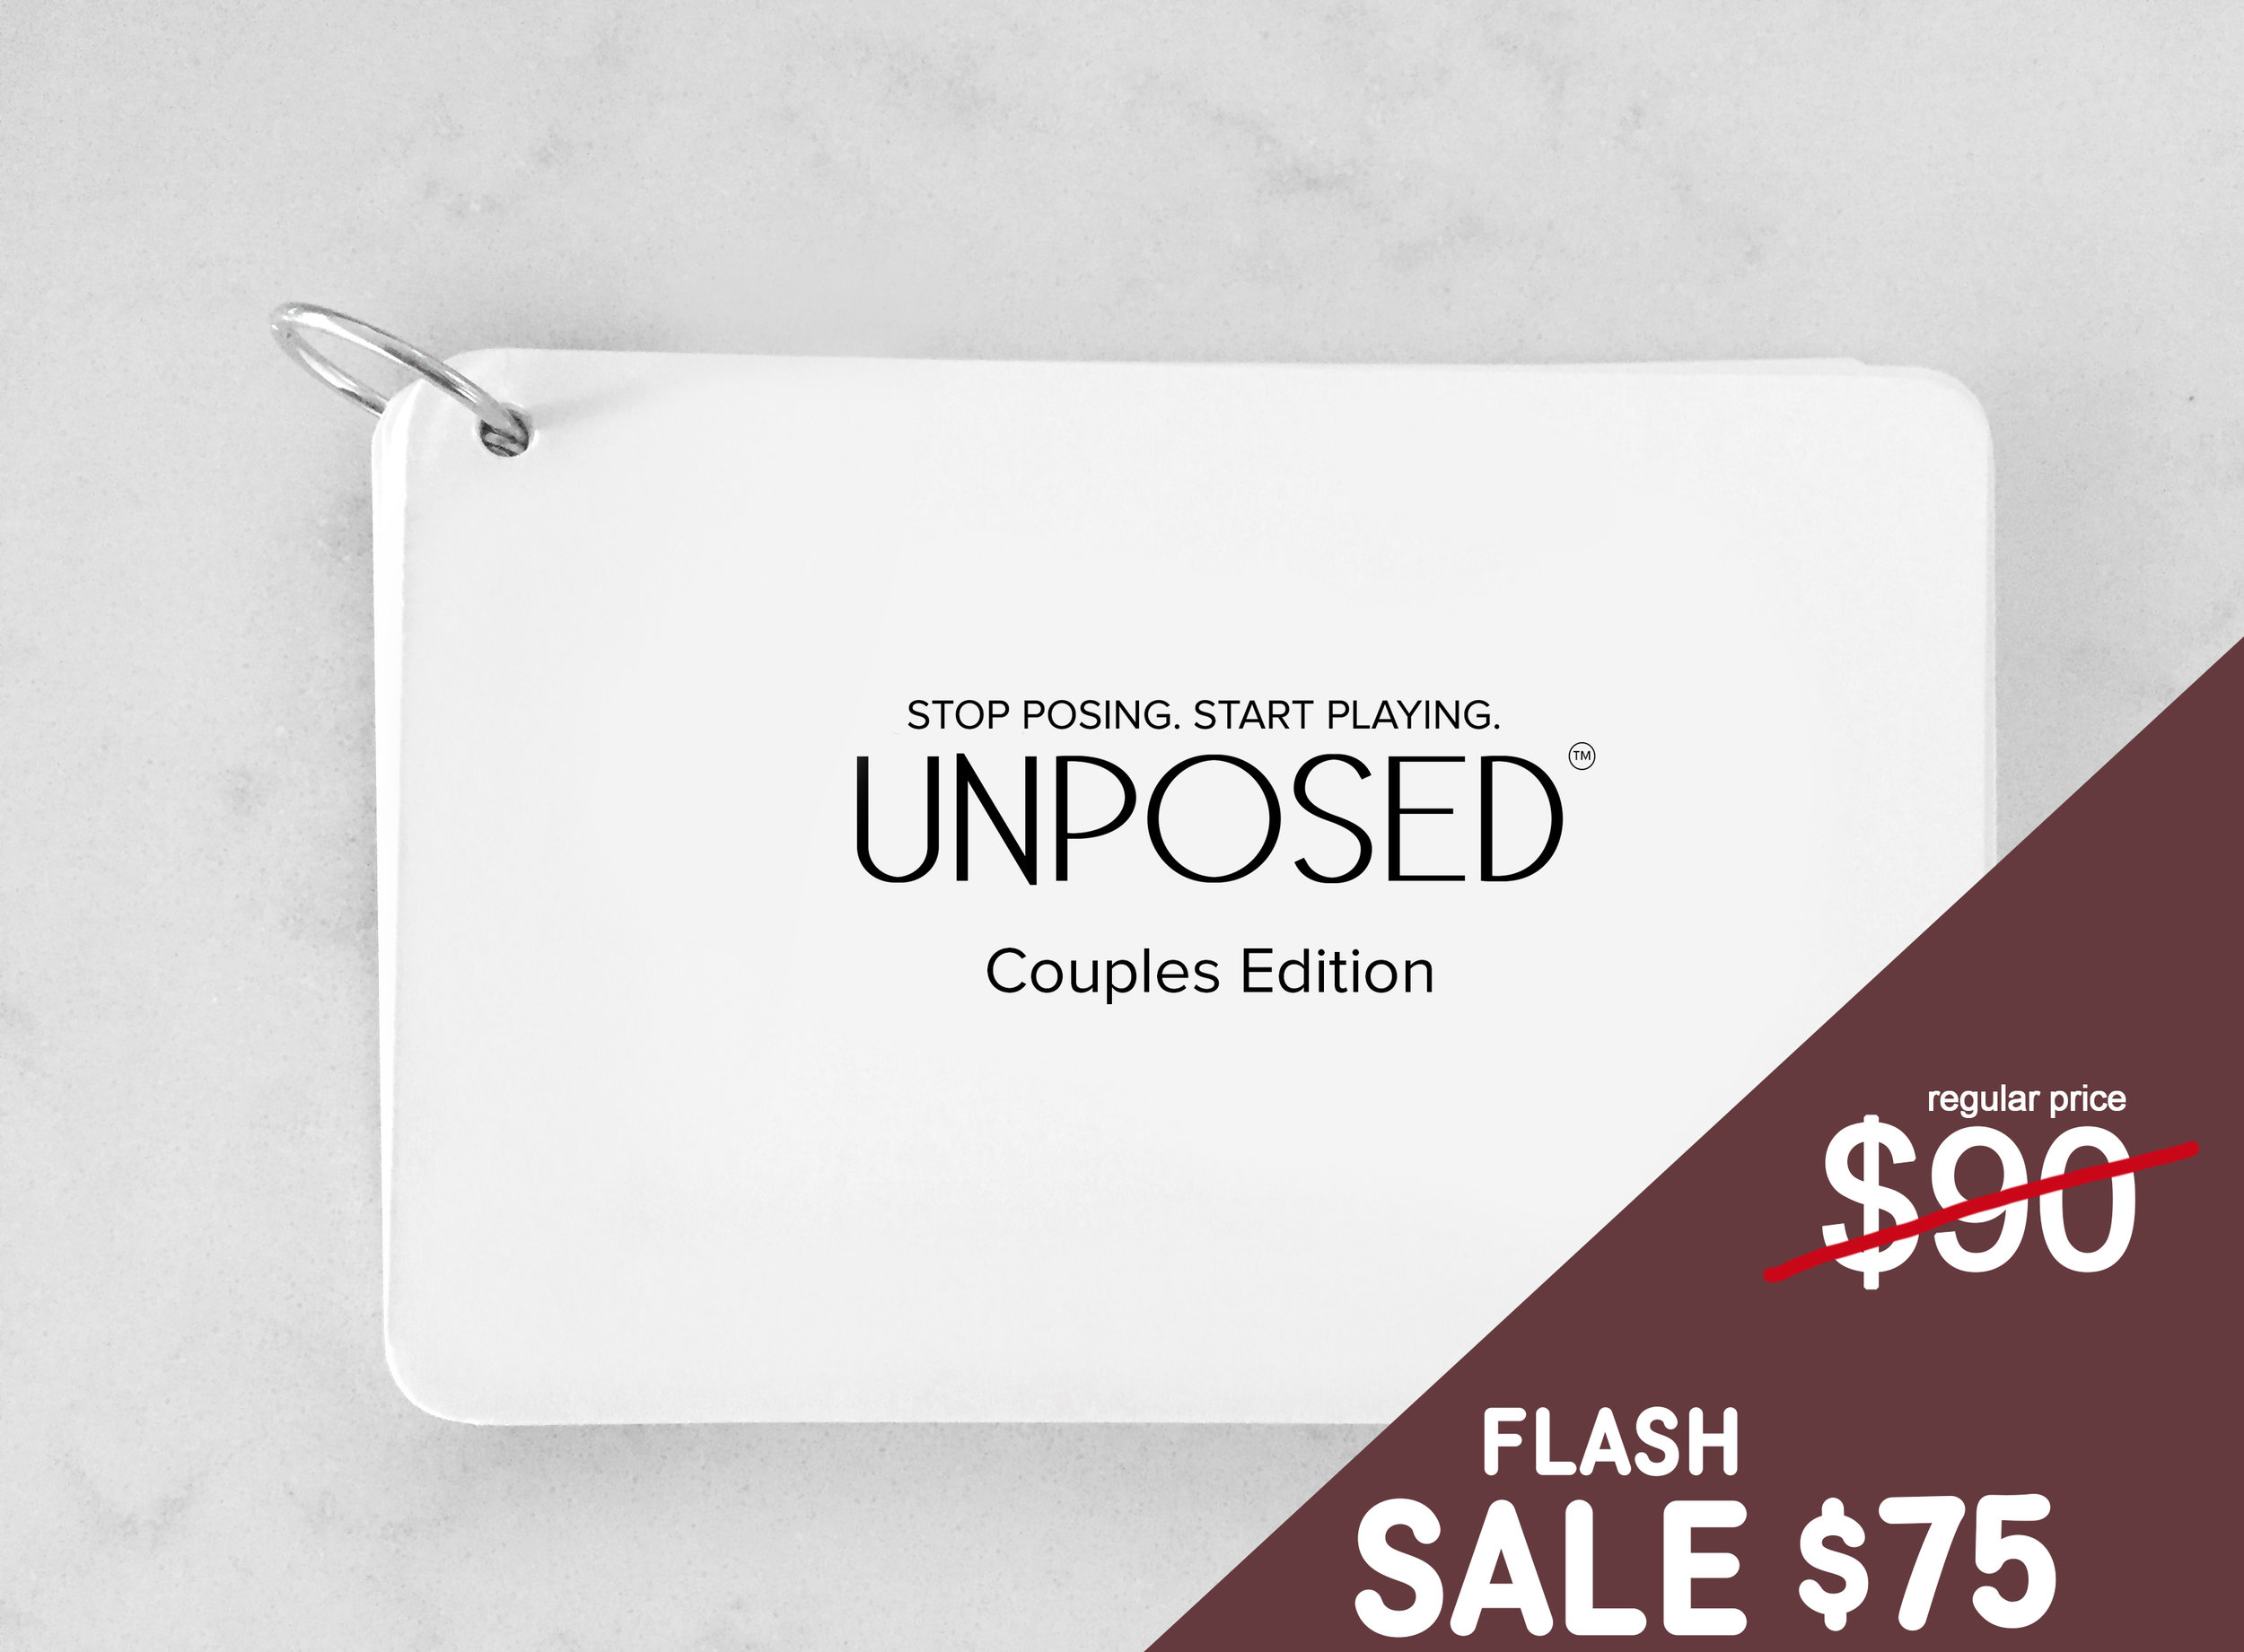 couplessale.jpg